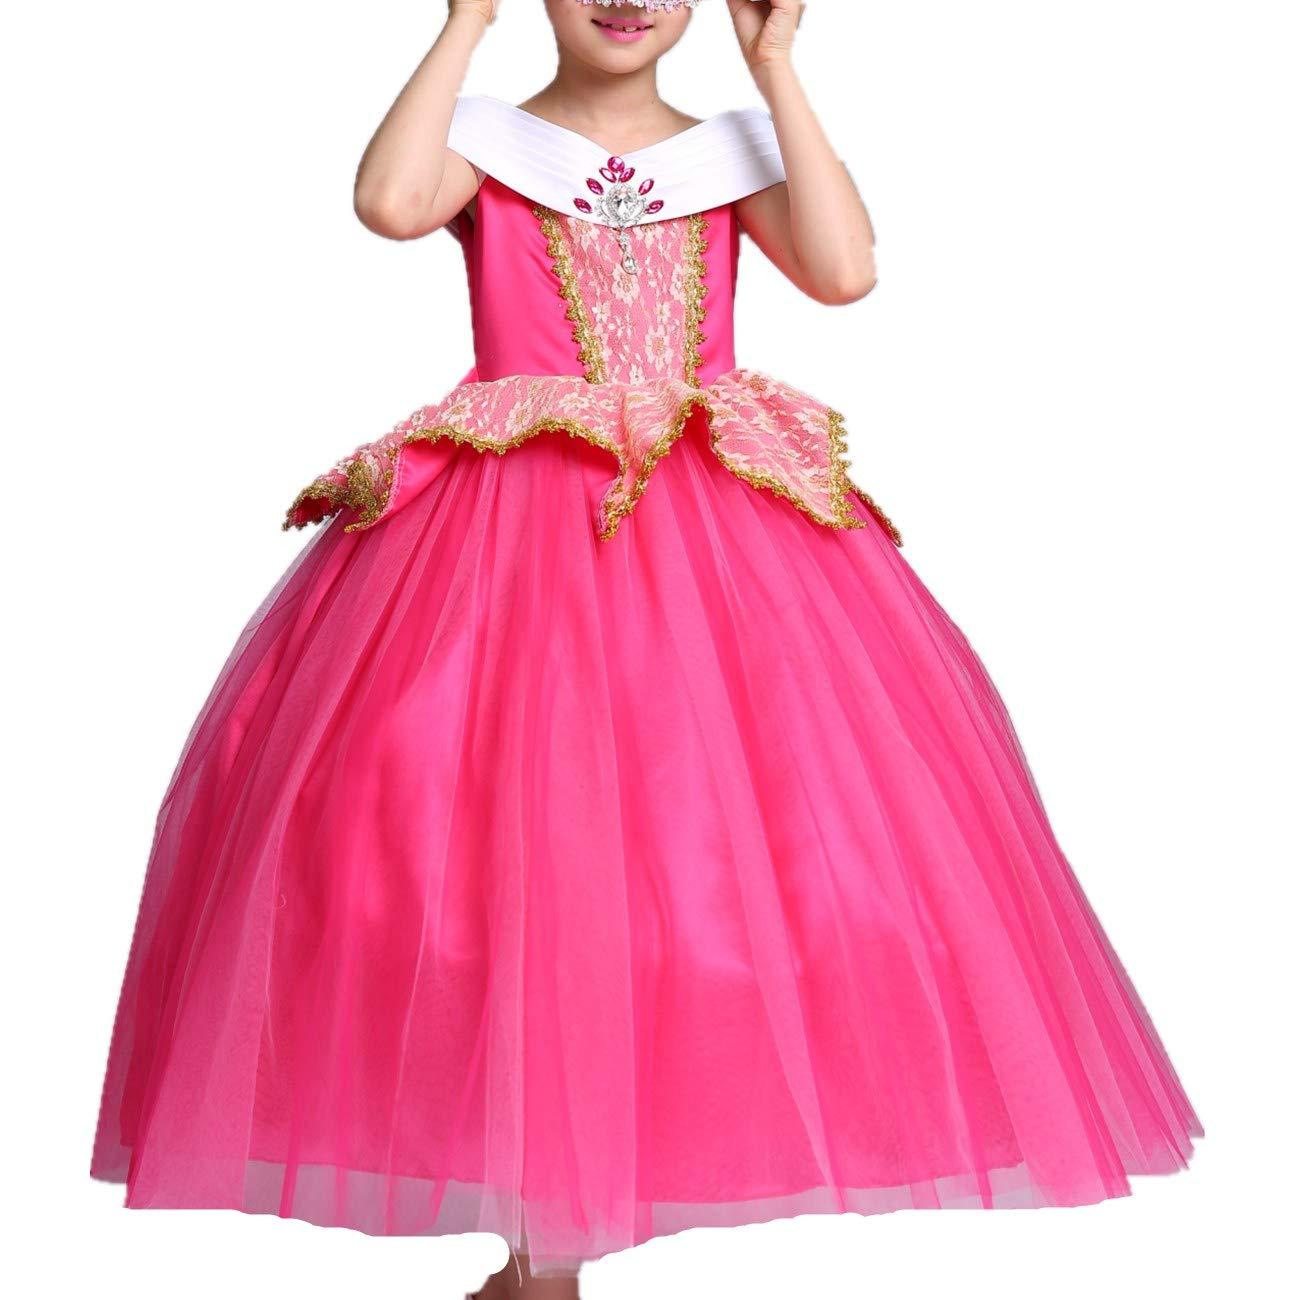 LOBTY Disfraz de Princesa Aurora para Niñas Rosa Traje de ...